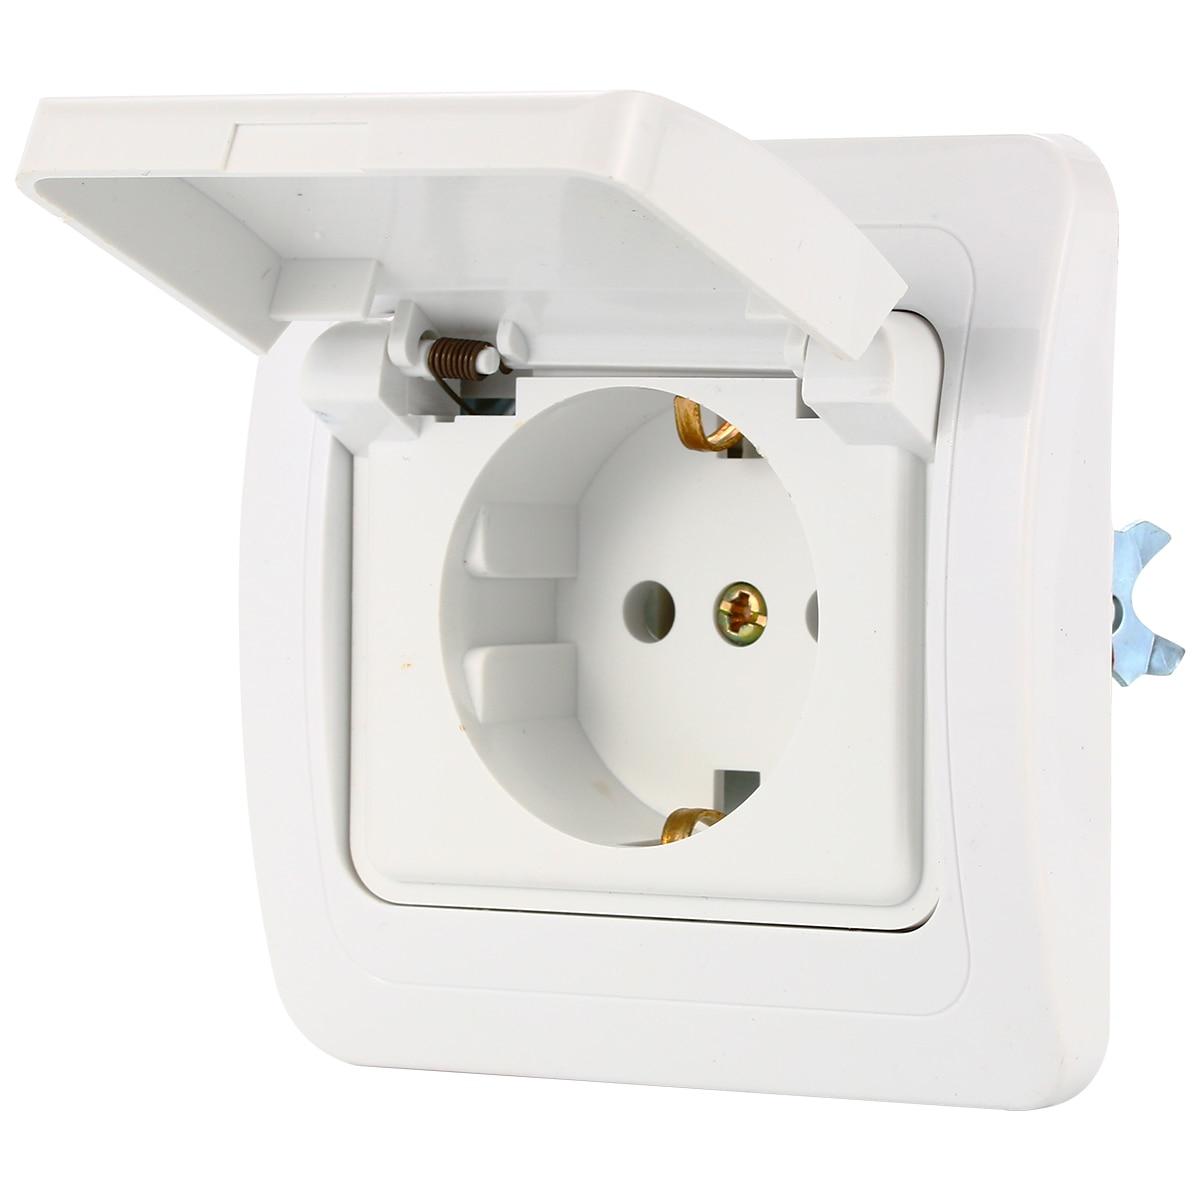 European Ac Wiring 18 Diagram Images Diagrams Outlet Color 16a 250v Korea Receptacle Power Schuko Germany Socket Bi132 508519